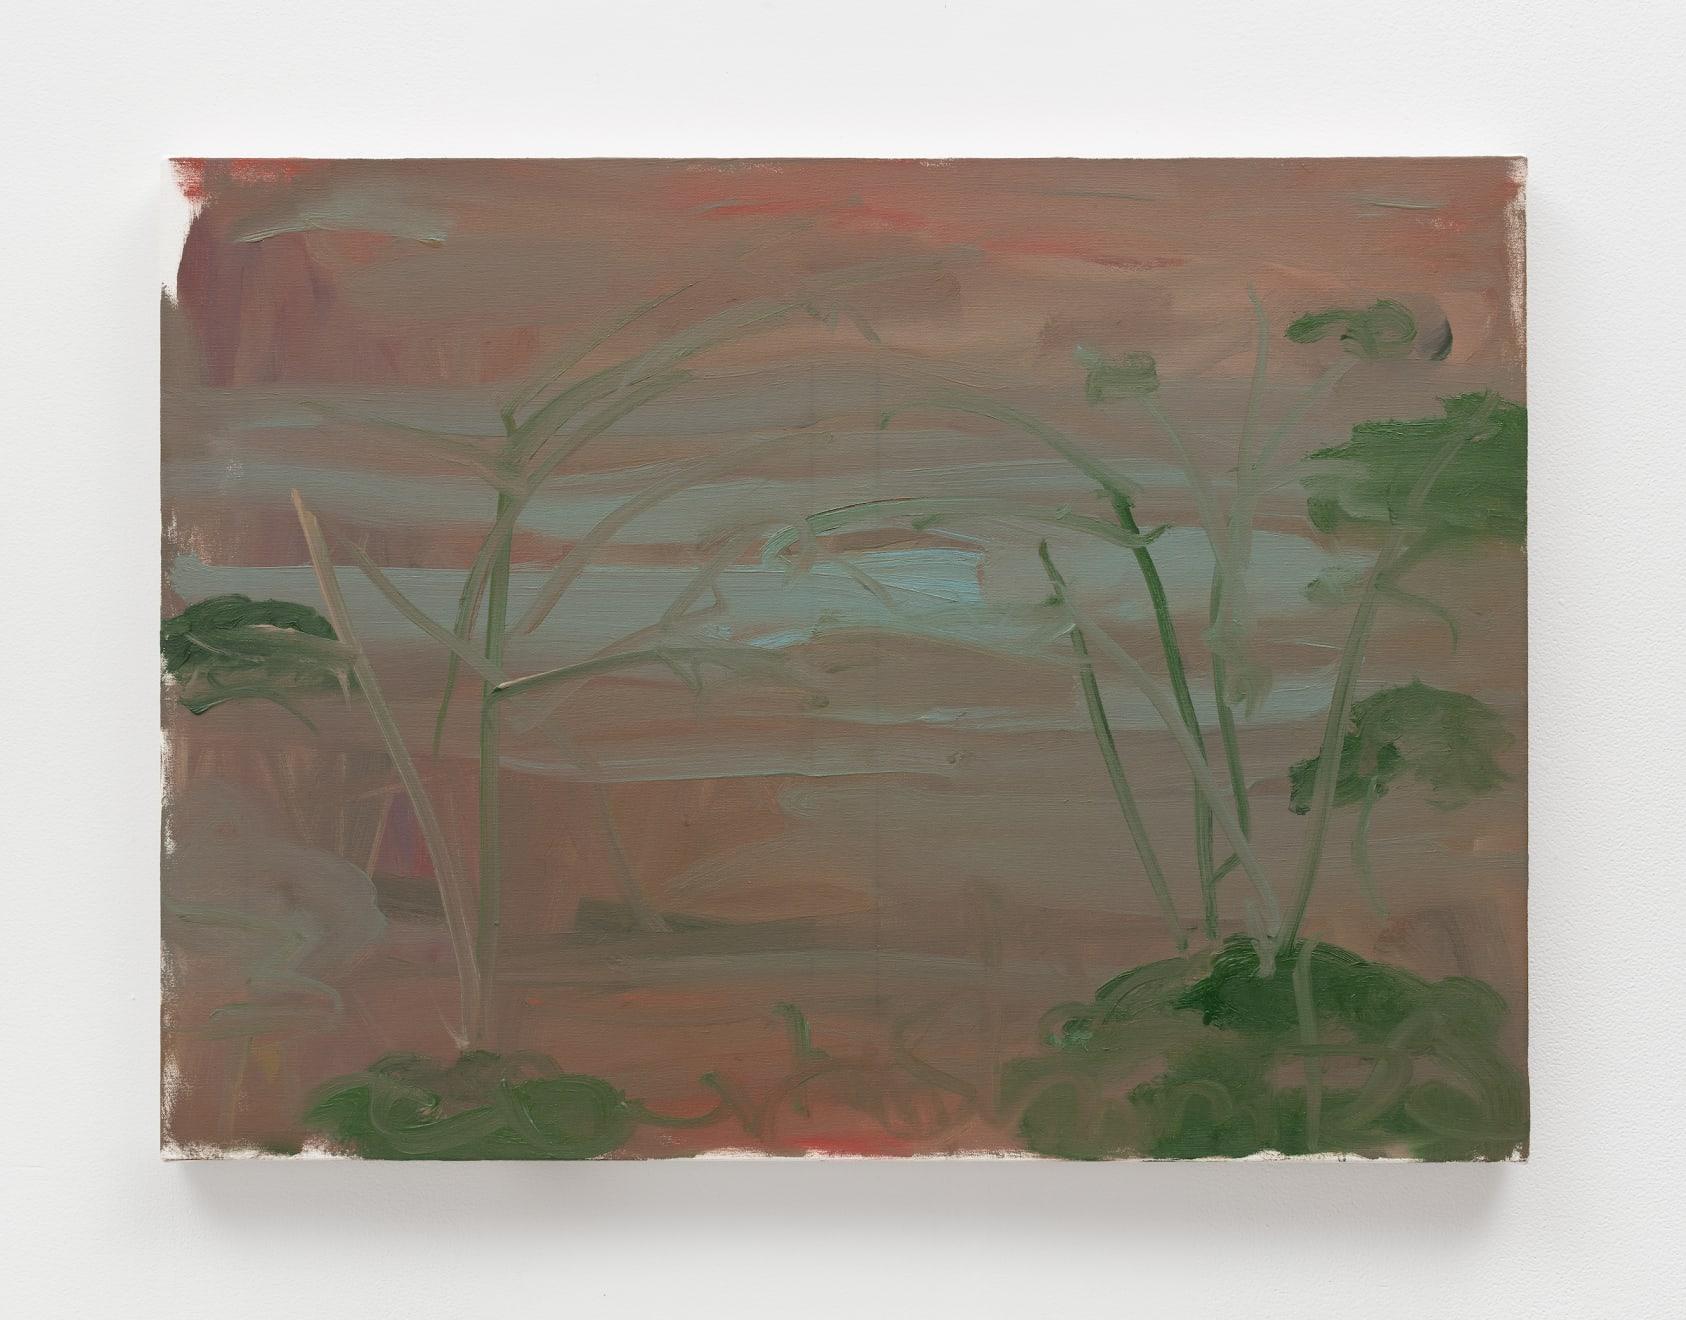 Trevor Shimizu, Ocean and Trees, 2019